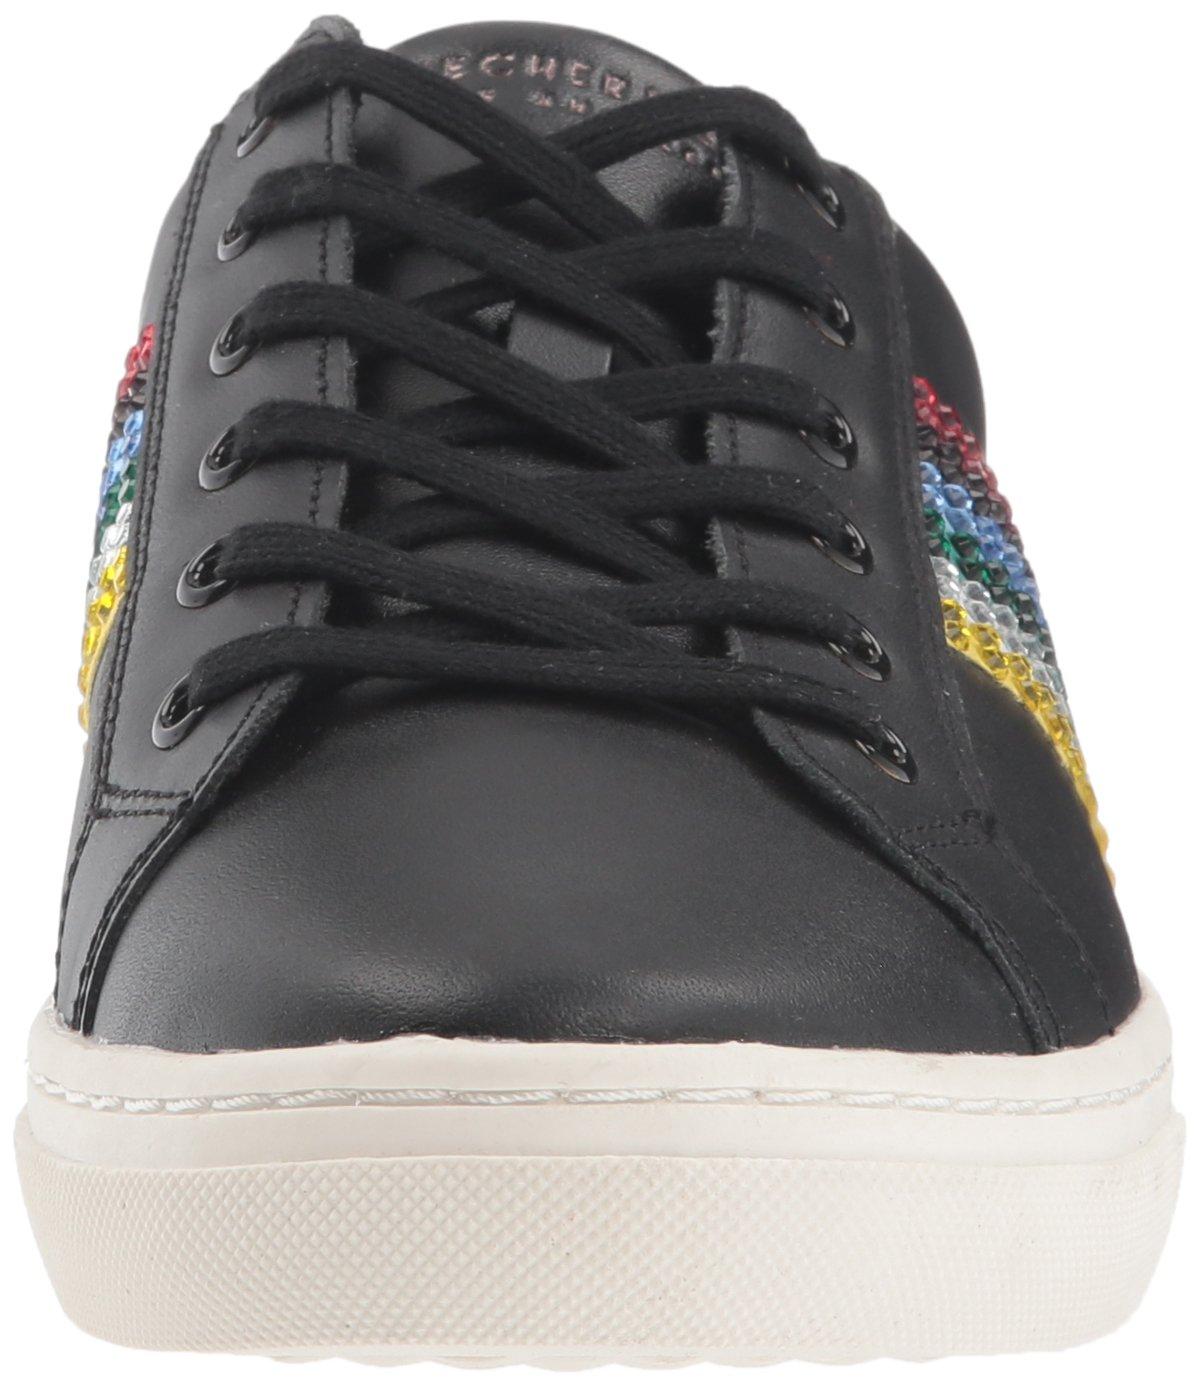 Skechers Women's Goldie-Rainbow Sneaker B0781VZZPG 11 B(M) US Black